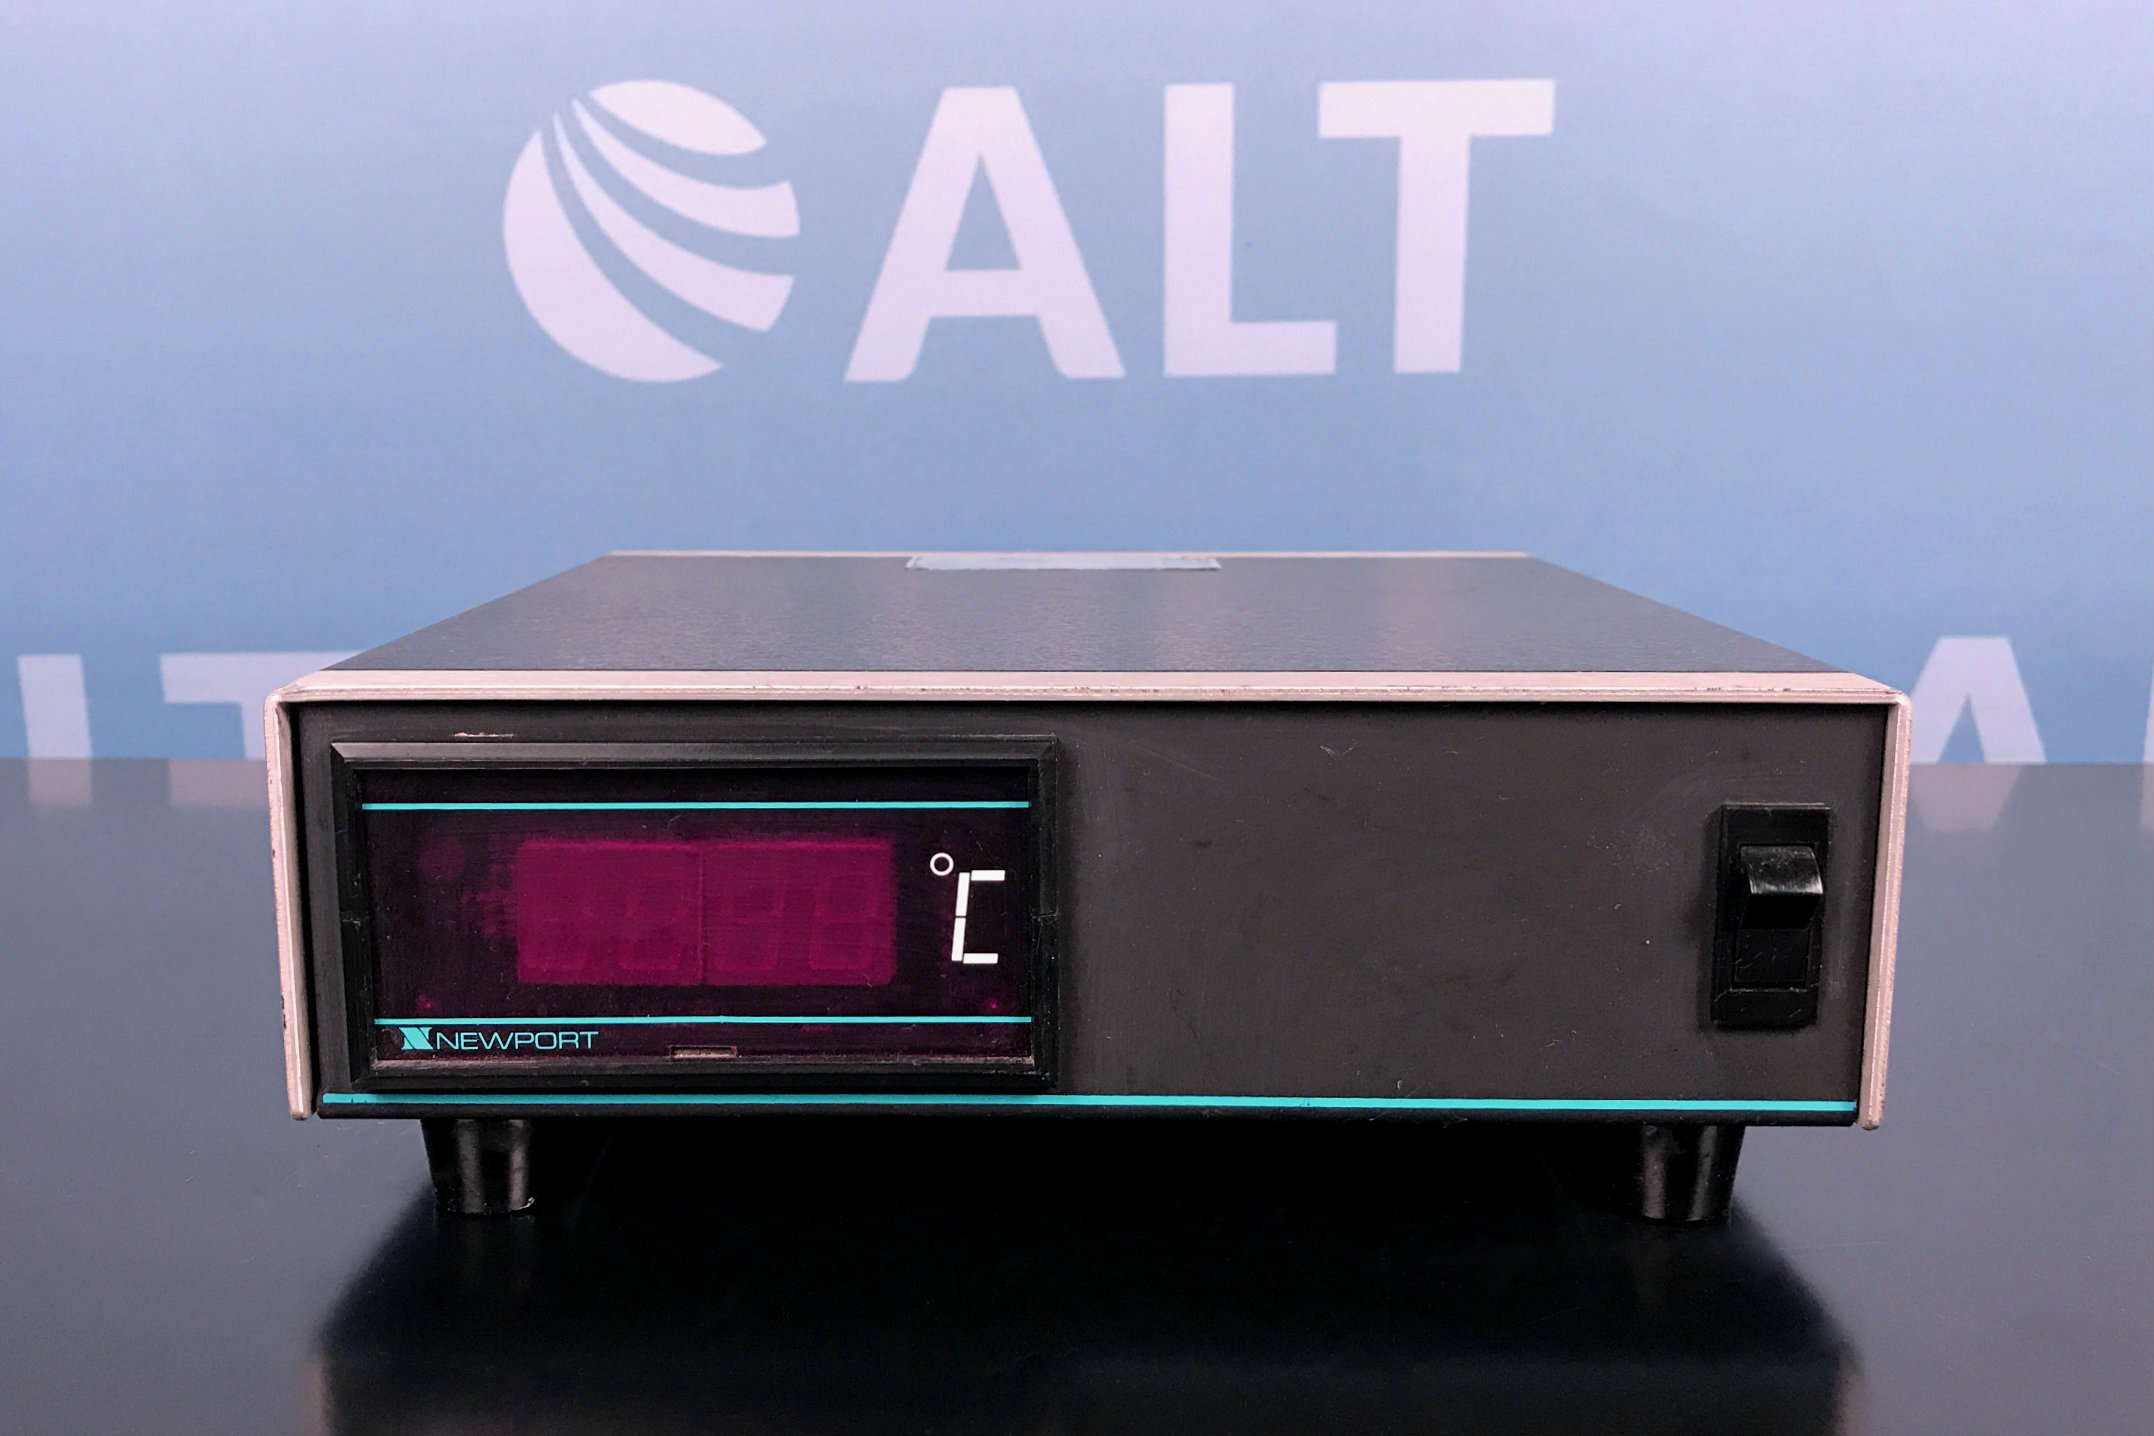 Newport Laboratories 267B-TC-2 Temperature Indicator (Pryometer) Image